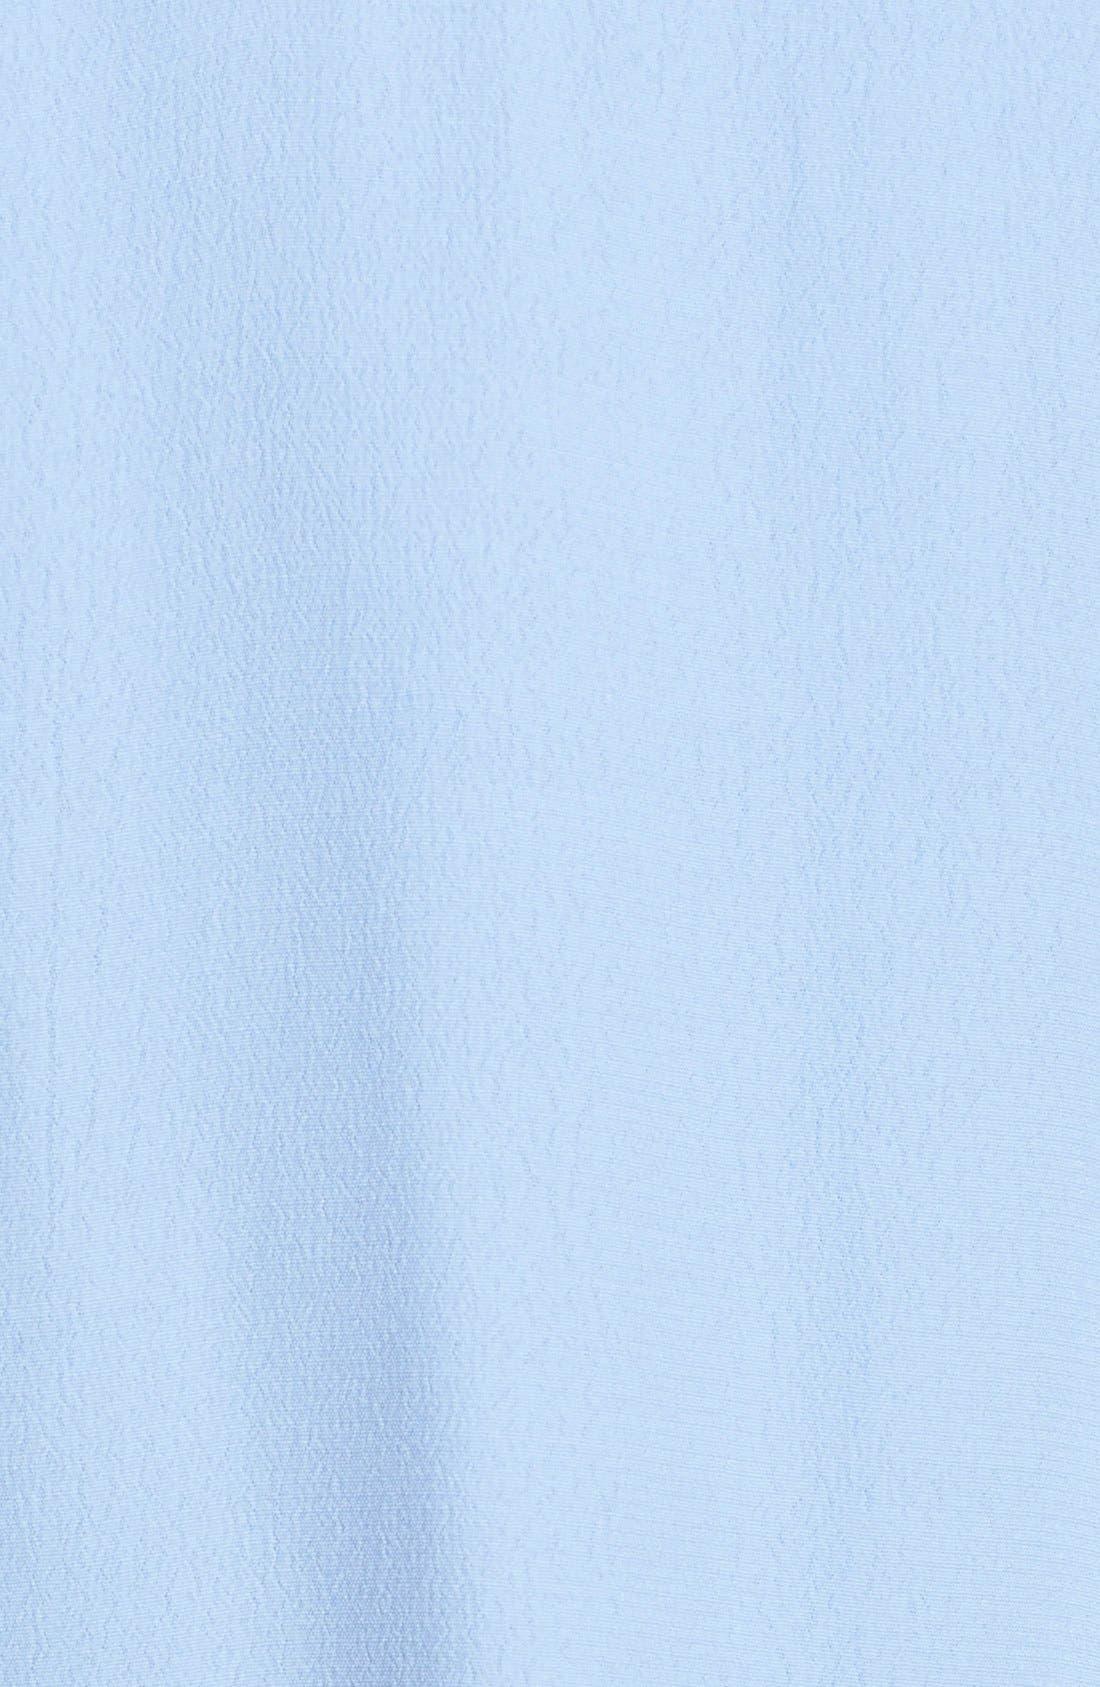 ASTR Lace Strap Silk Blend Dress,                             Alternate thumbnail 2, color,                             428